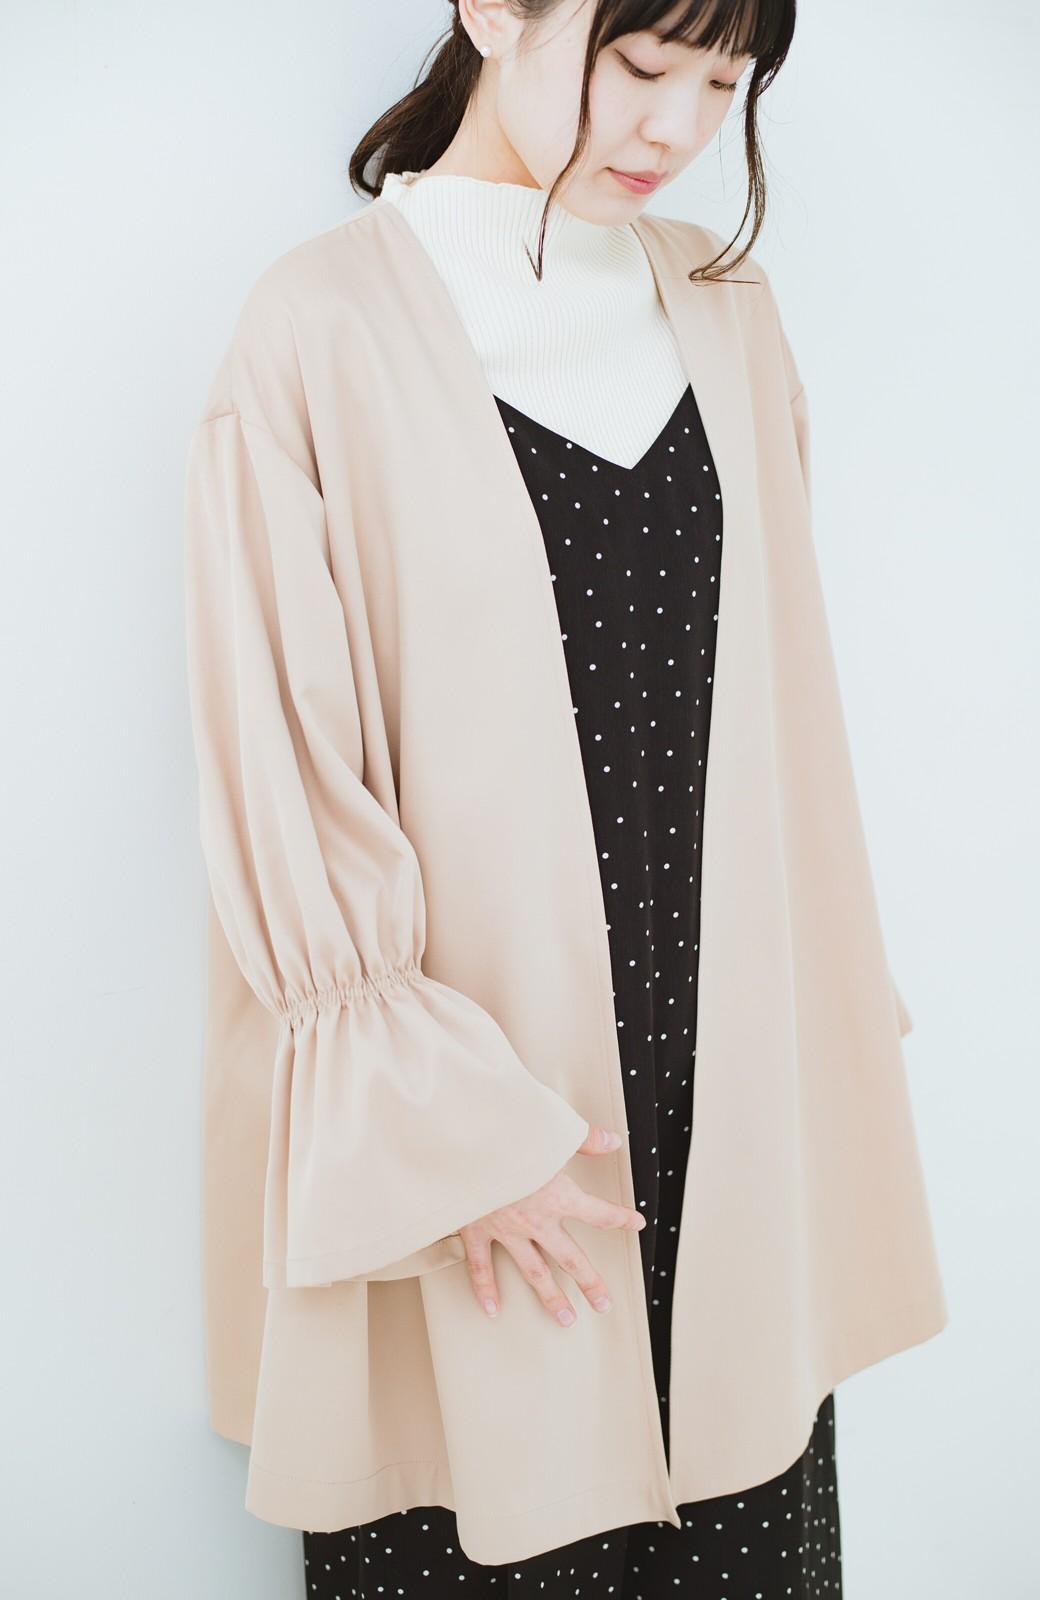 haco! ただ羽織るだけでオシャレに見える 気軽なフレアースリーブコート <ベージュ>の商品写真15